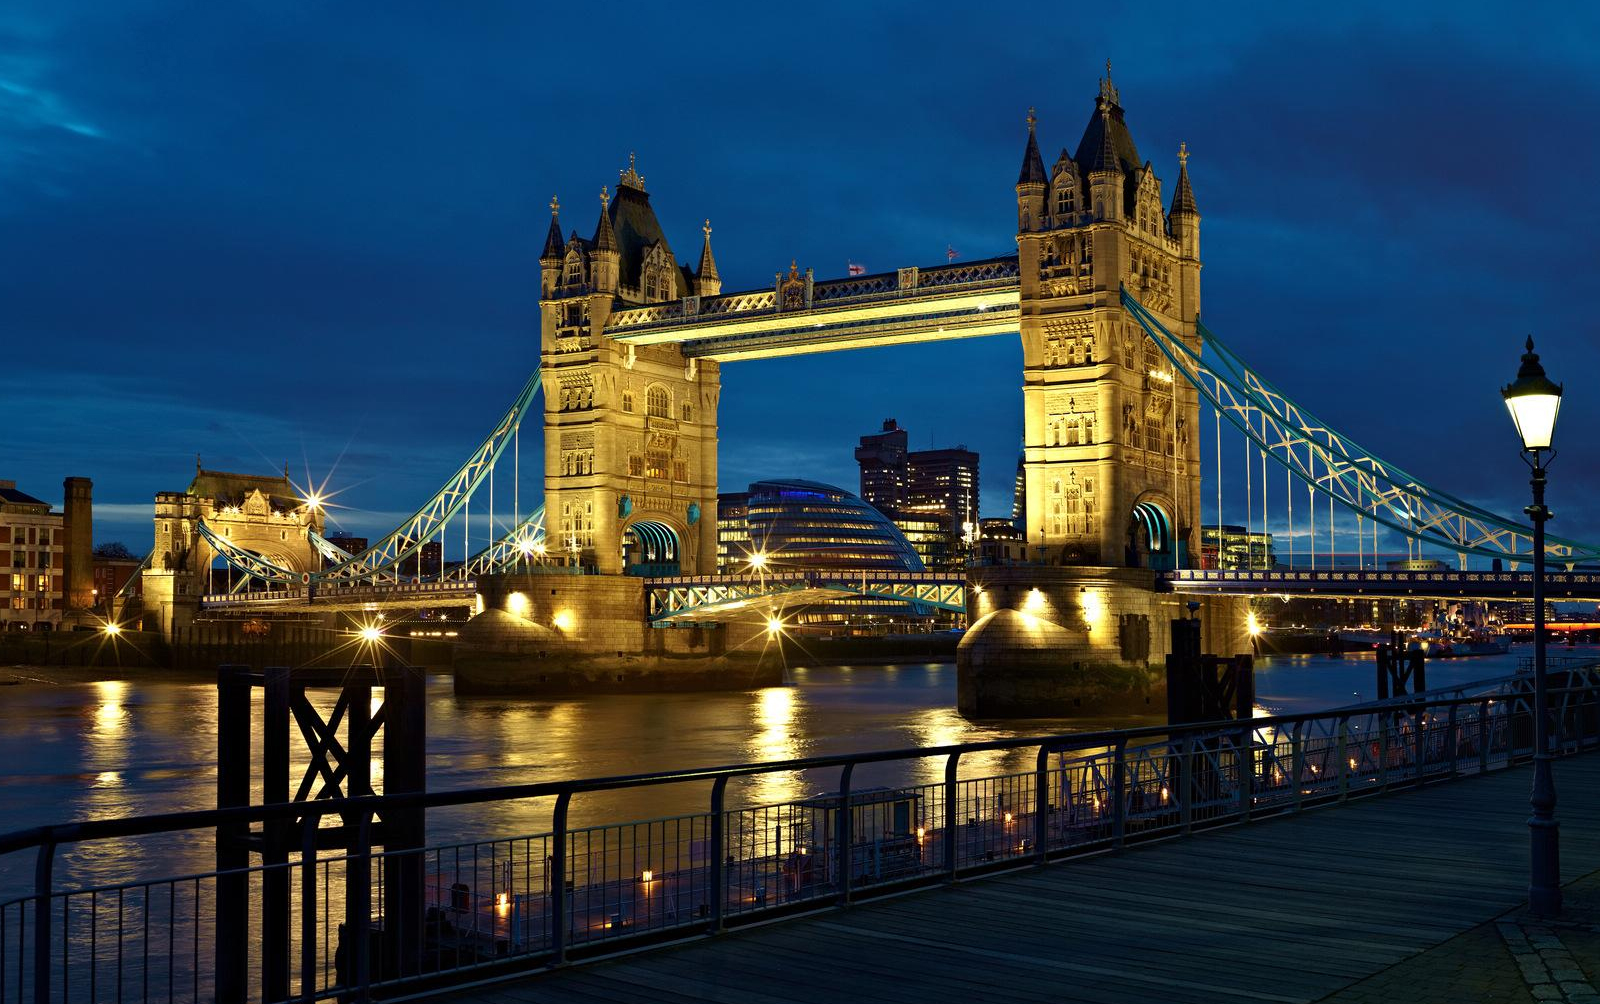 GLC鉅霖遊學 雙景點渡假遊學 英國Torbay和倫敦London